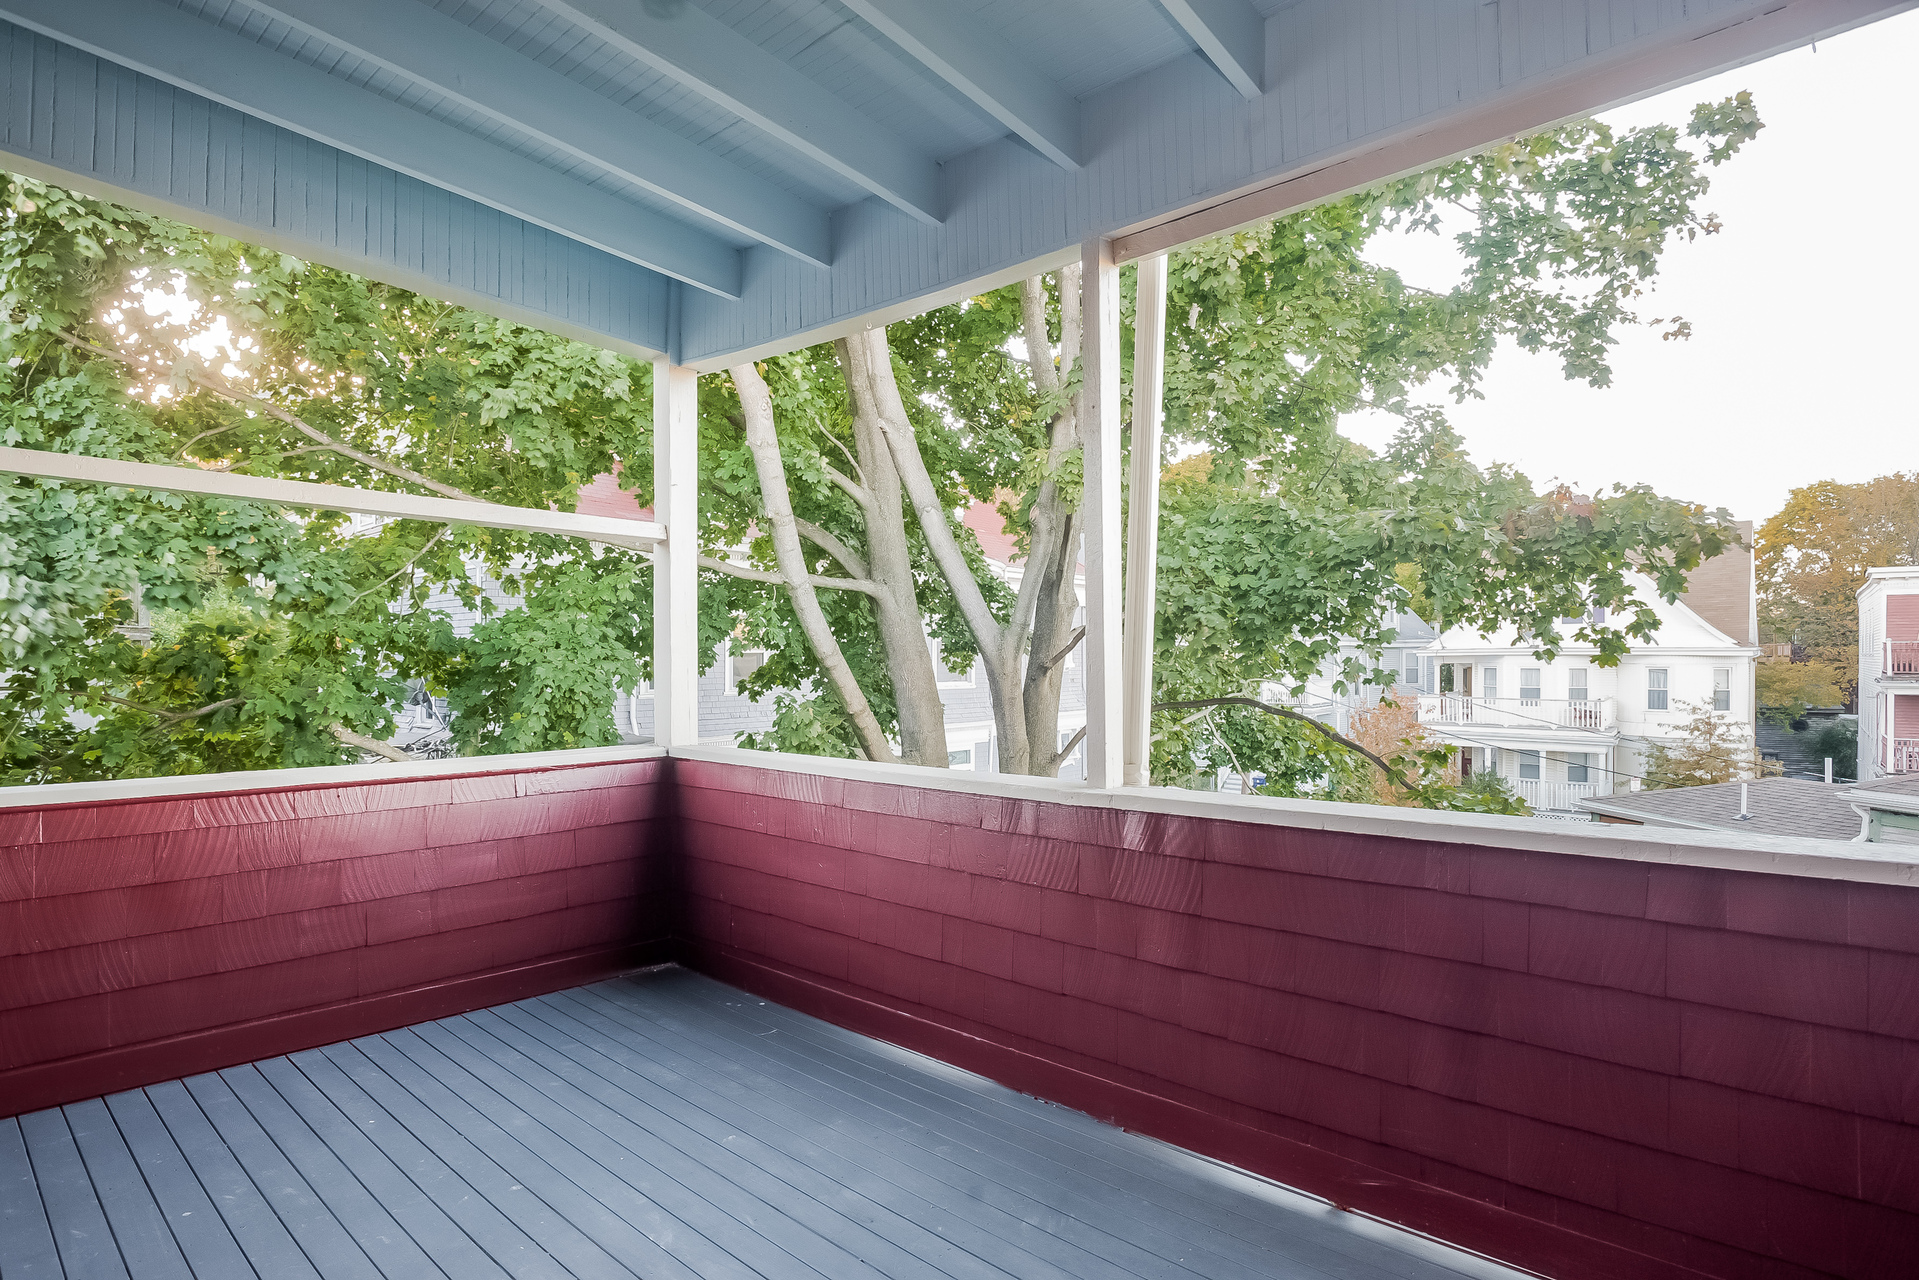 017-Deck-2172750-medium.jpg